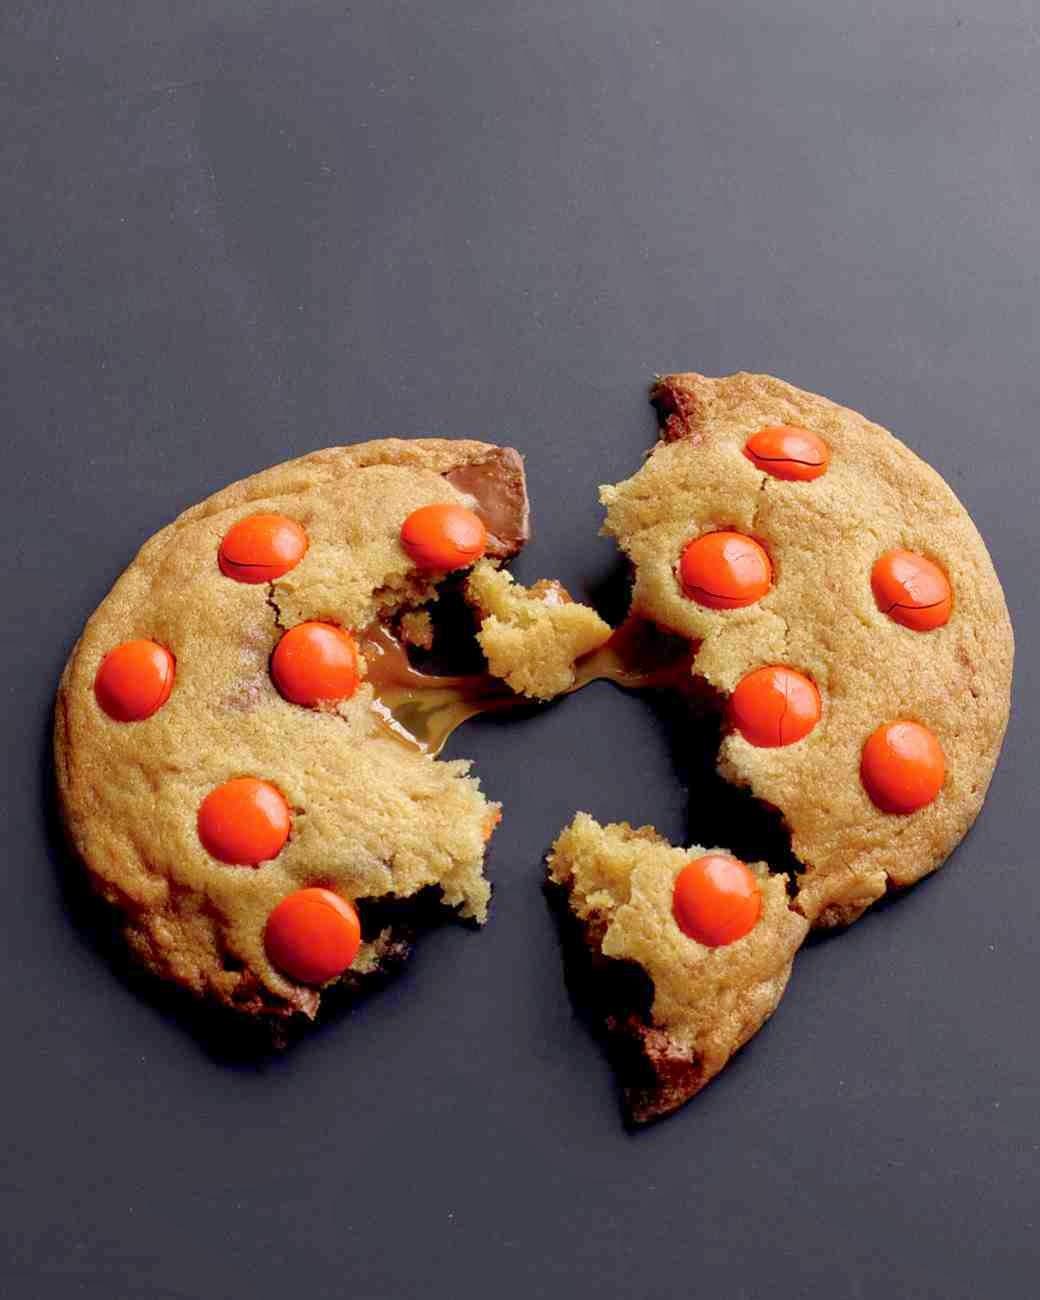 http://www.marthastewart.com/859645/chewy-caramel-mystery-cookies